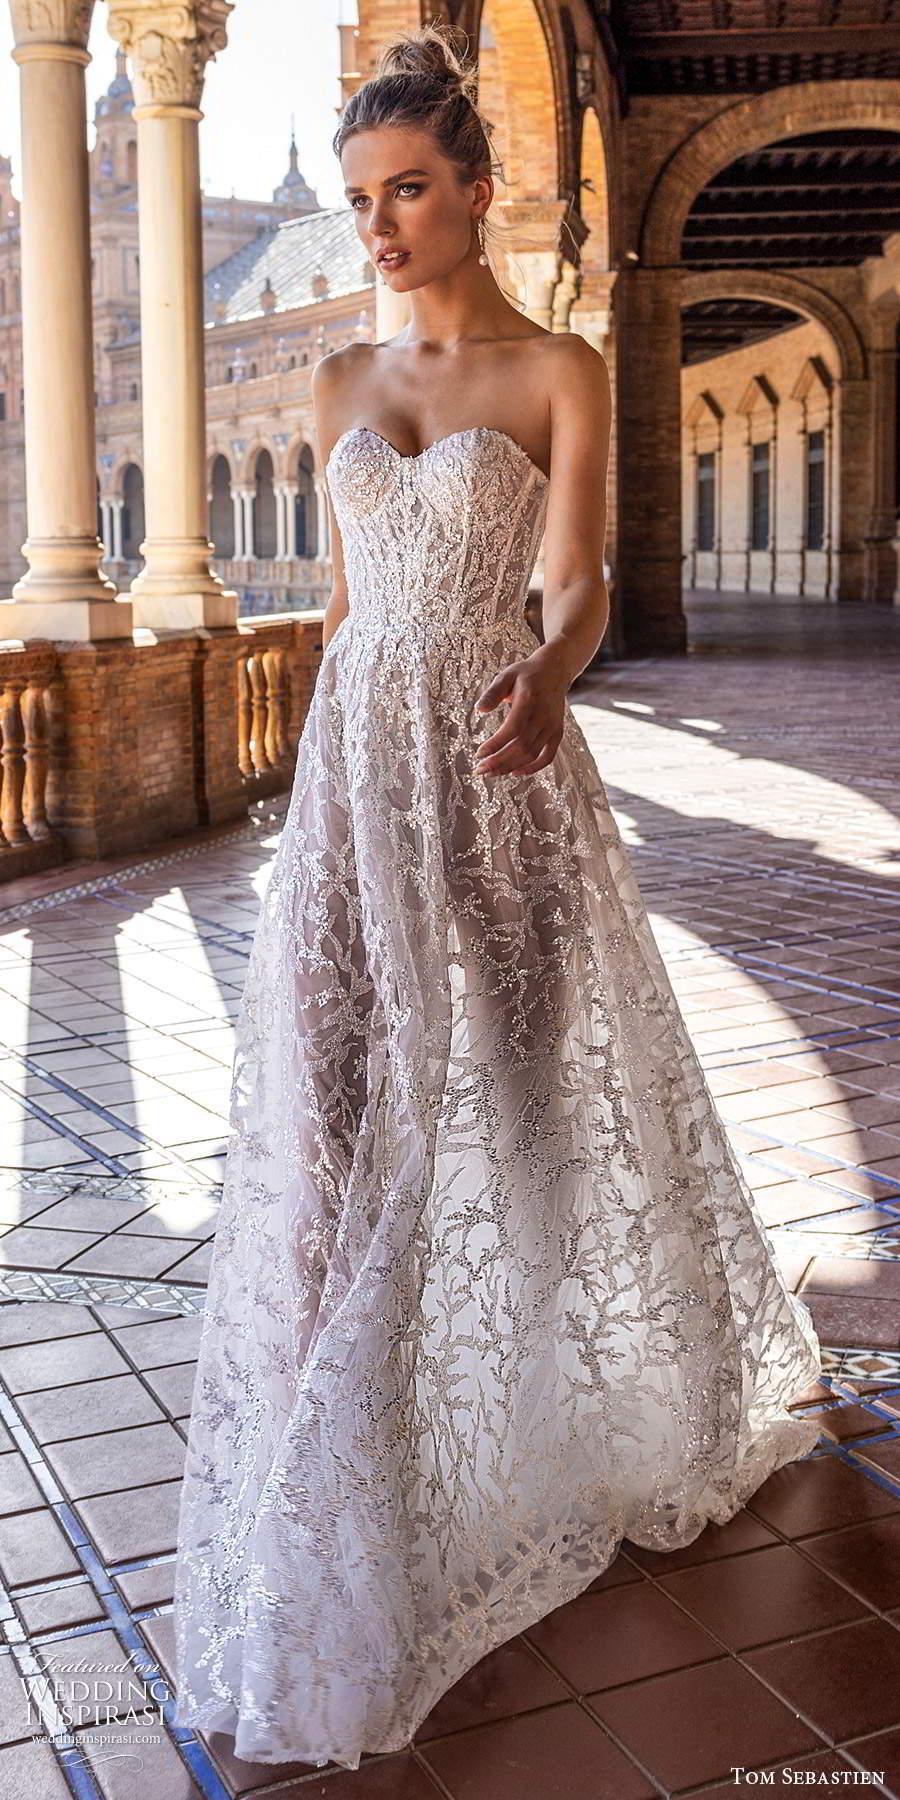 tom sebastien 2021 bridal strapless sweetheart neckline fully embellished a line ball gown wedding dress chapel train (2) mv